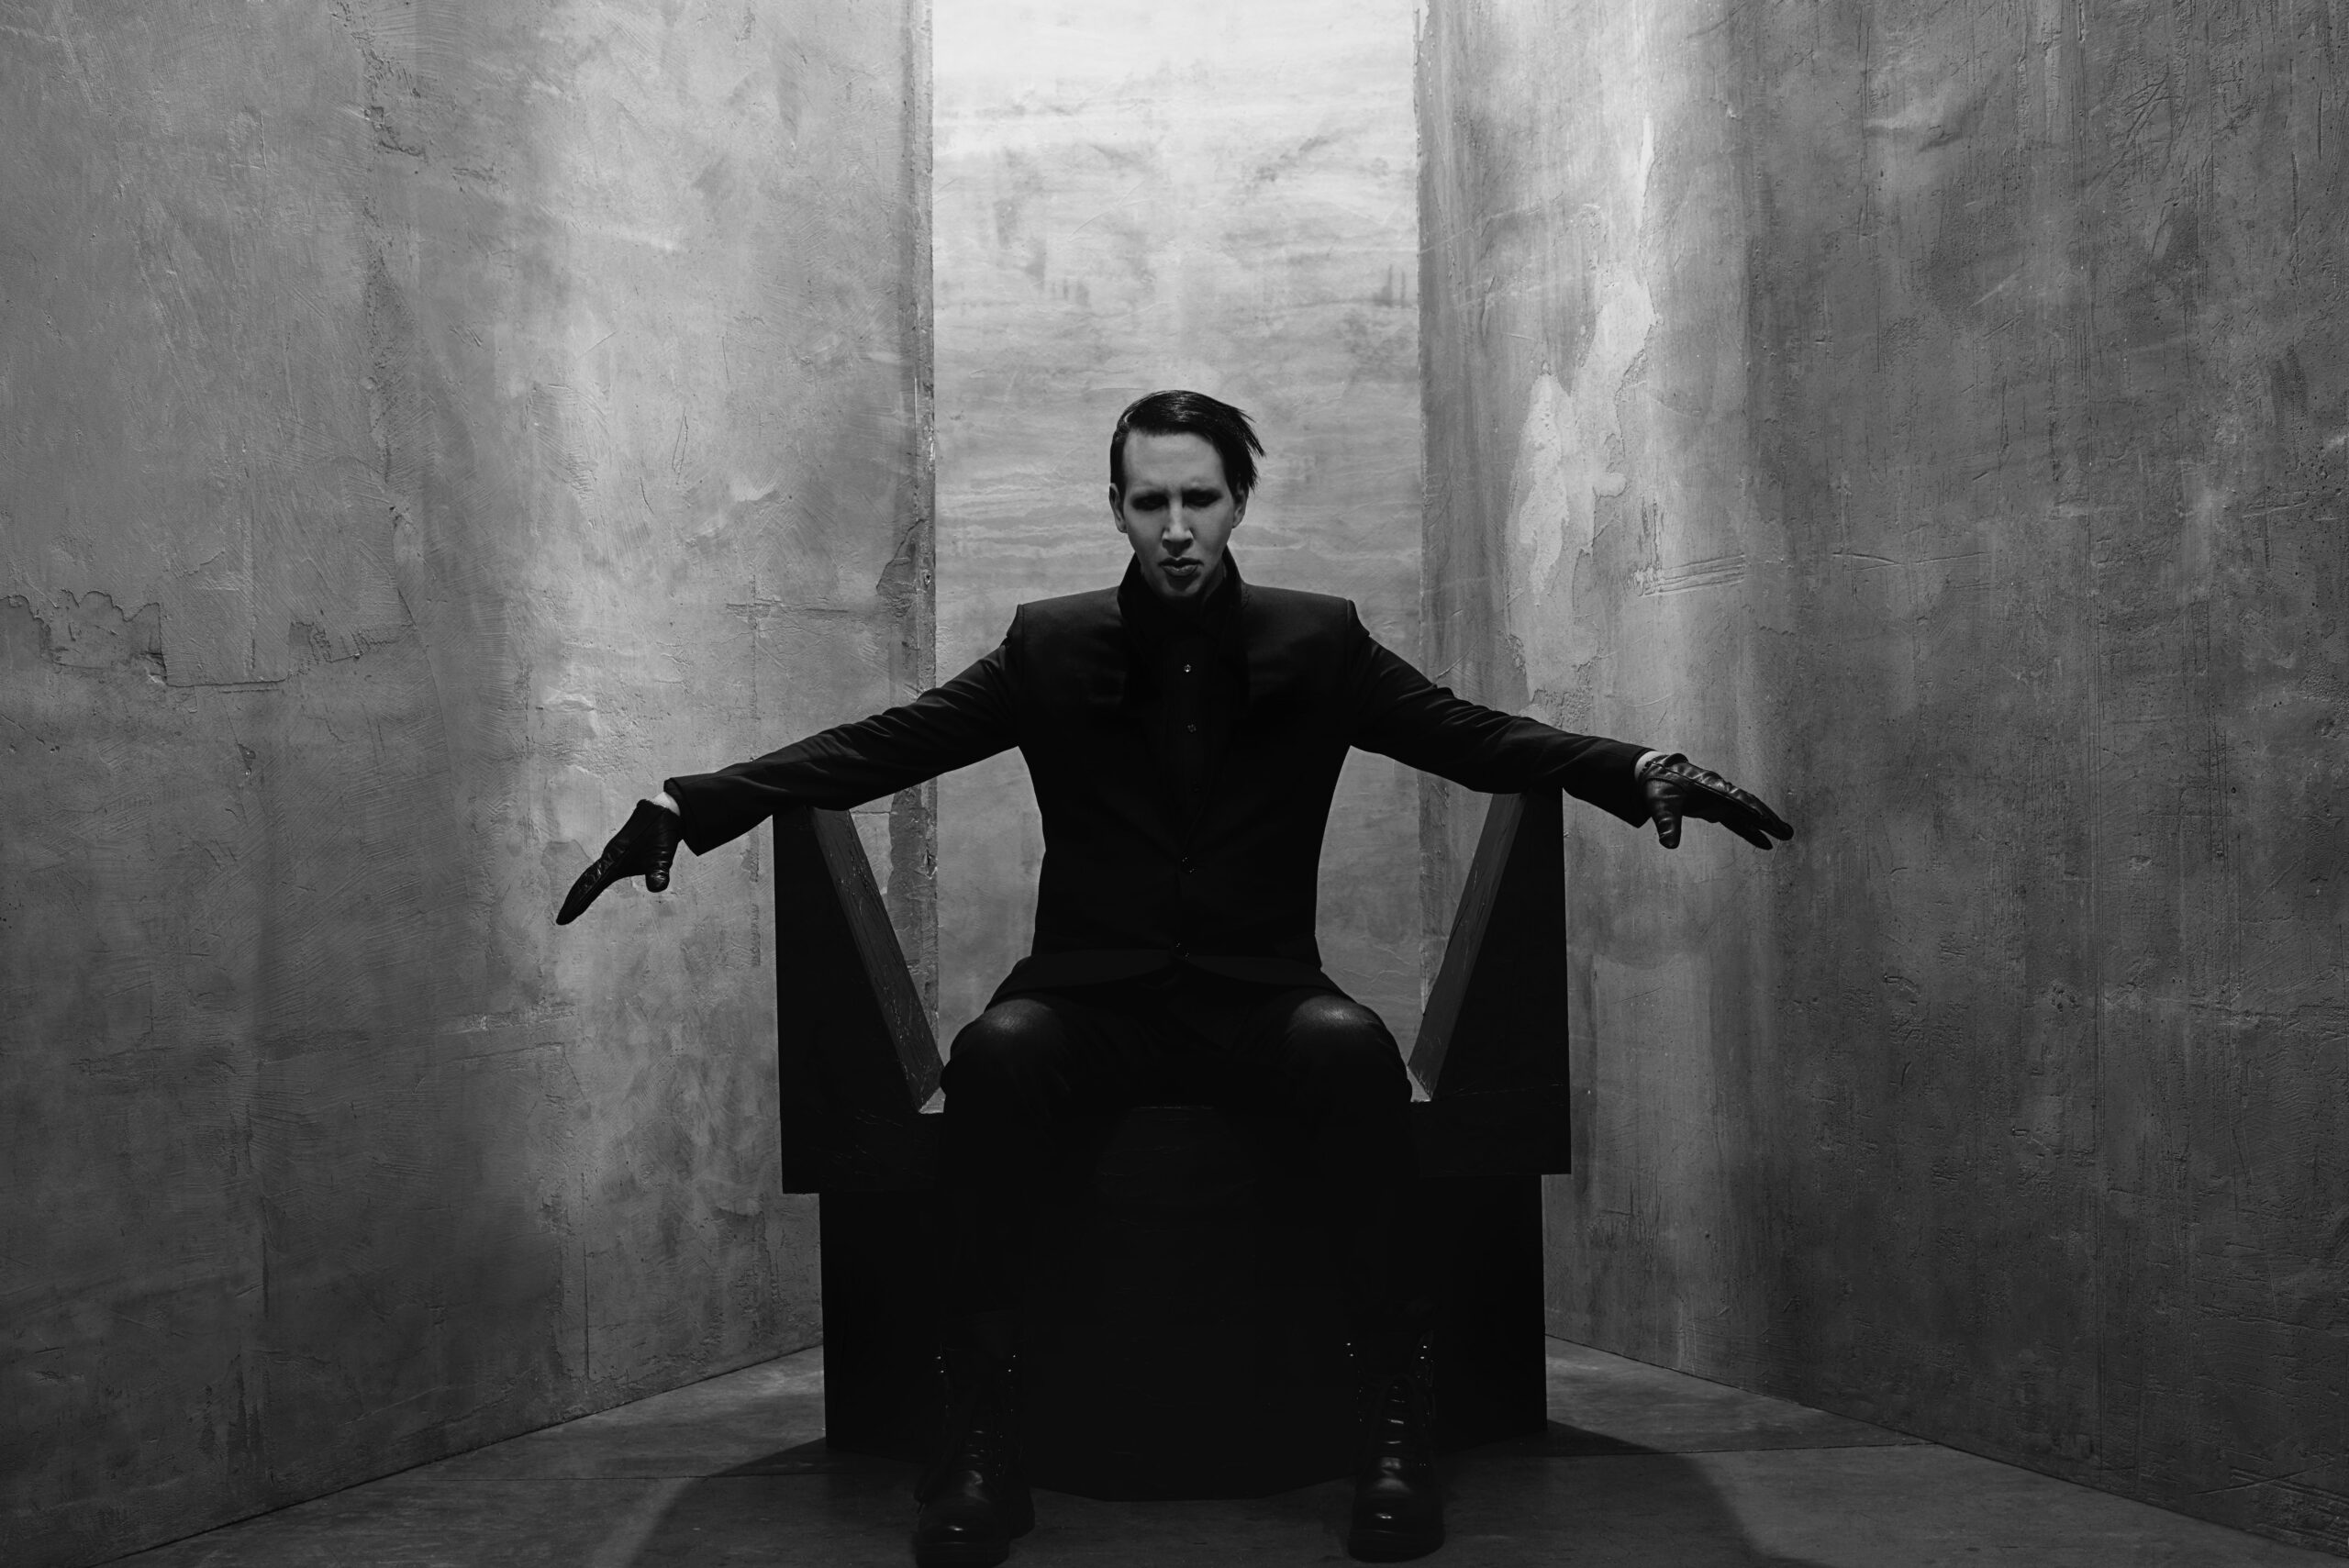 Marilyn Manson (Credit: Nicholas Alan Cope 2014)